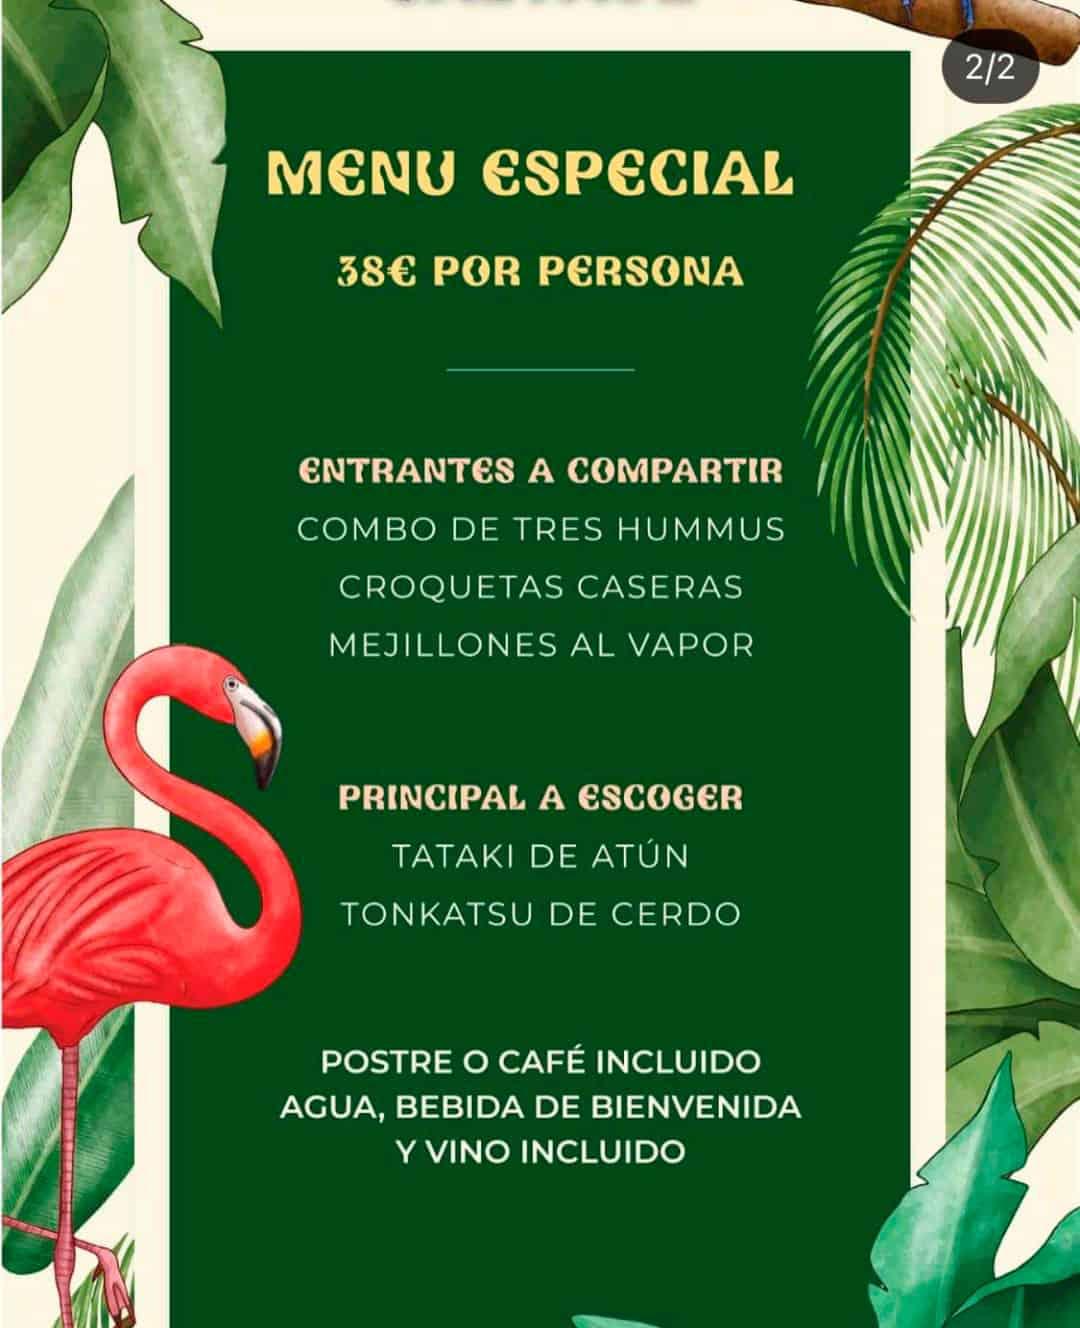 menu-special-concert-el-canijo-de-jerez-wild-restaurant-ibiza-2021-welcometoibiza